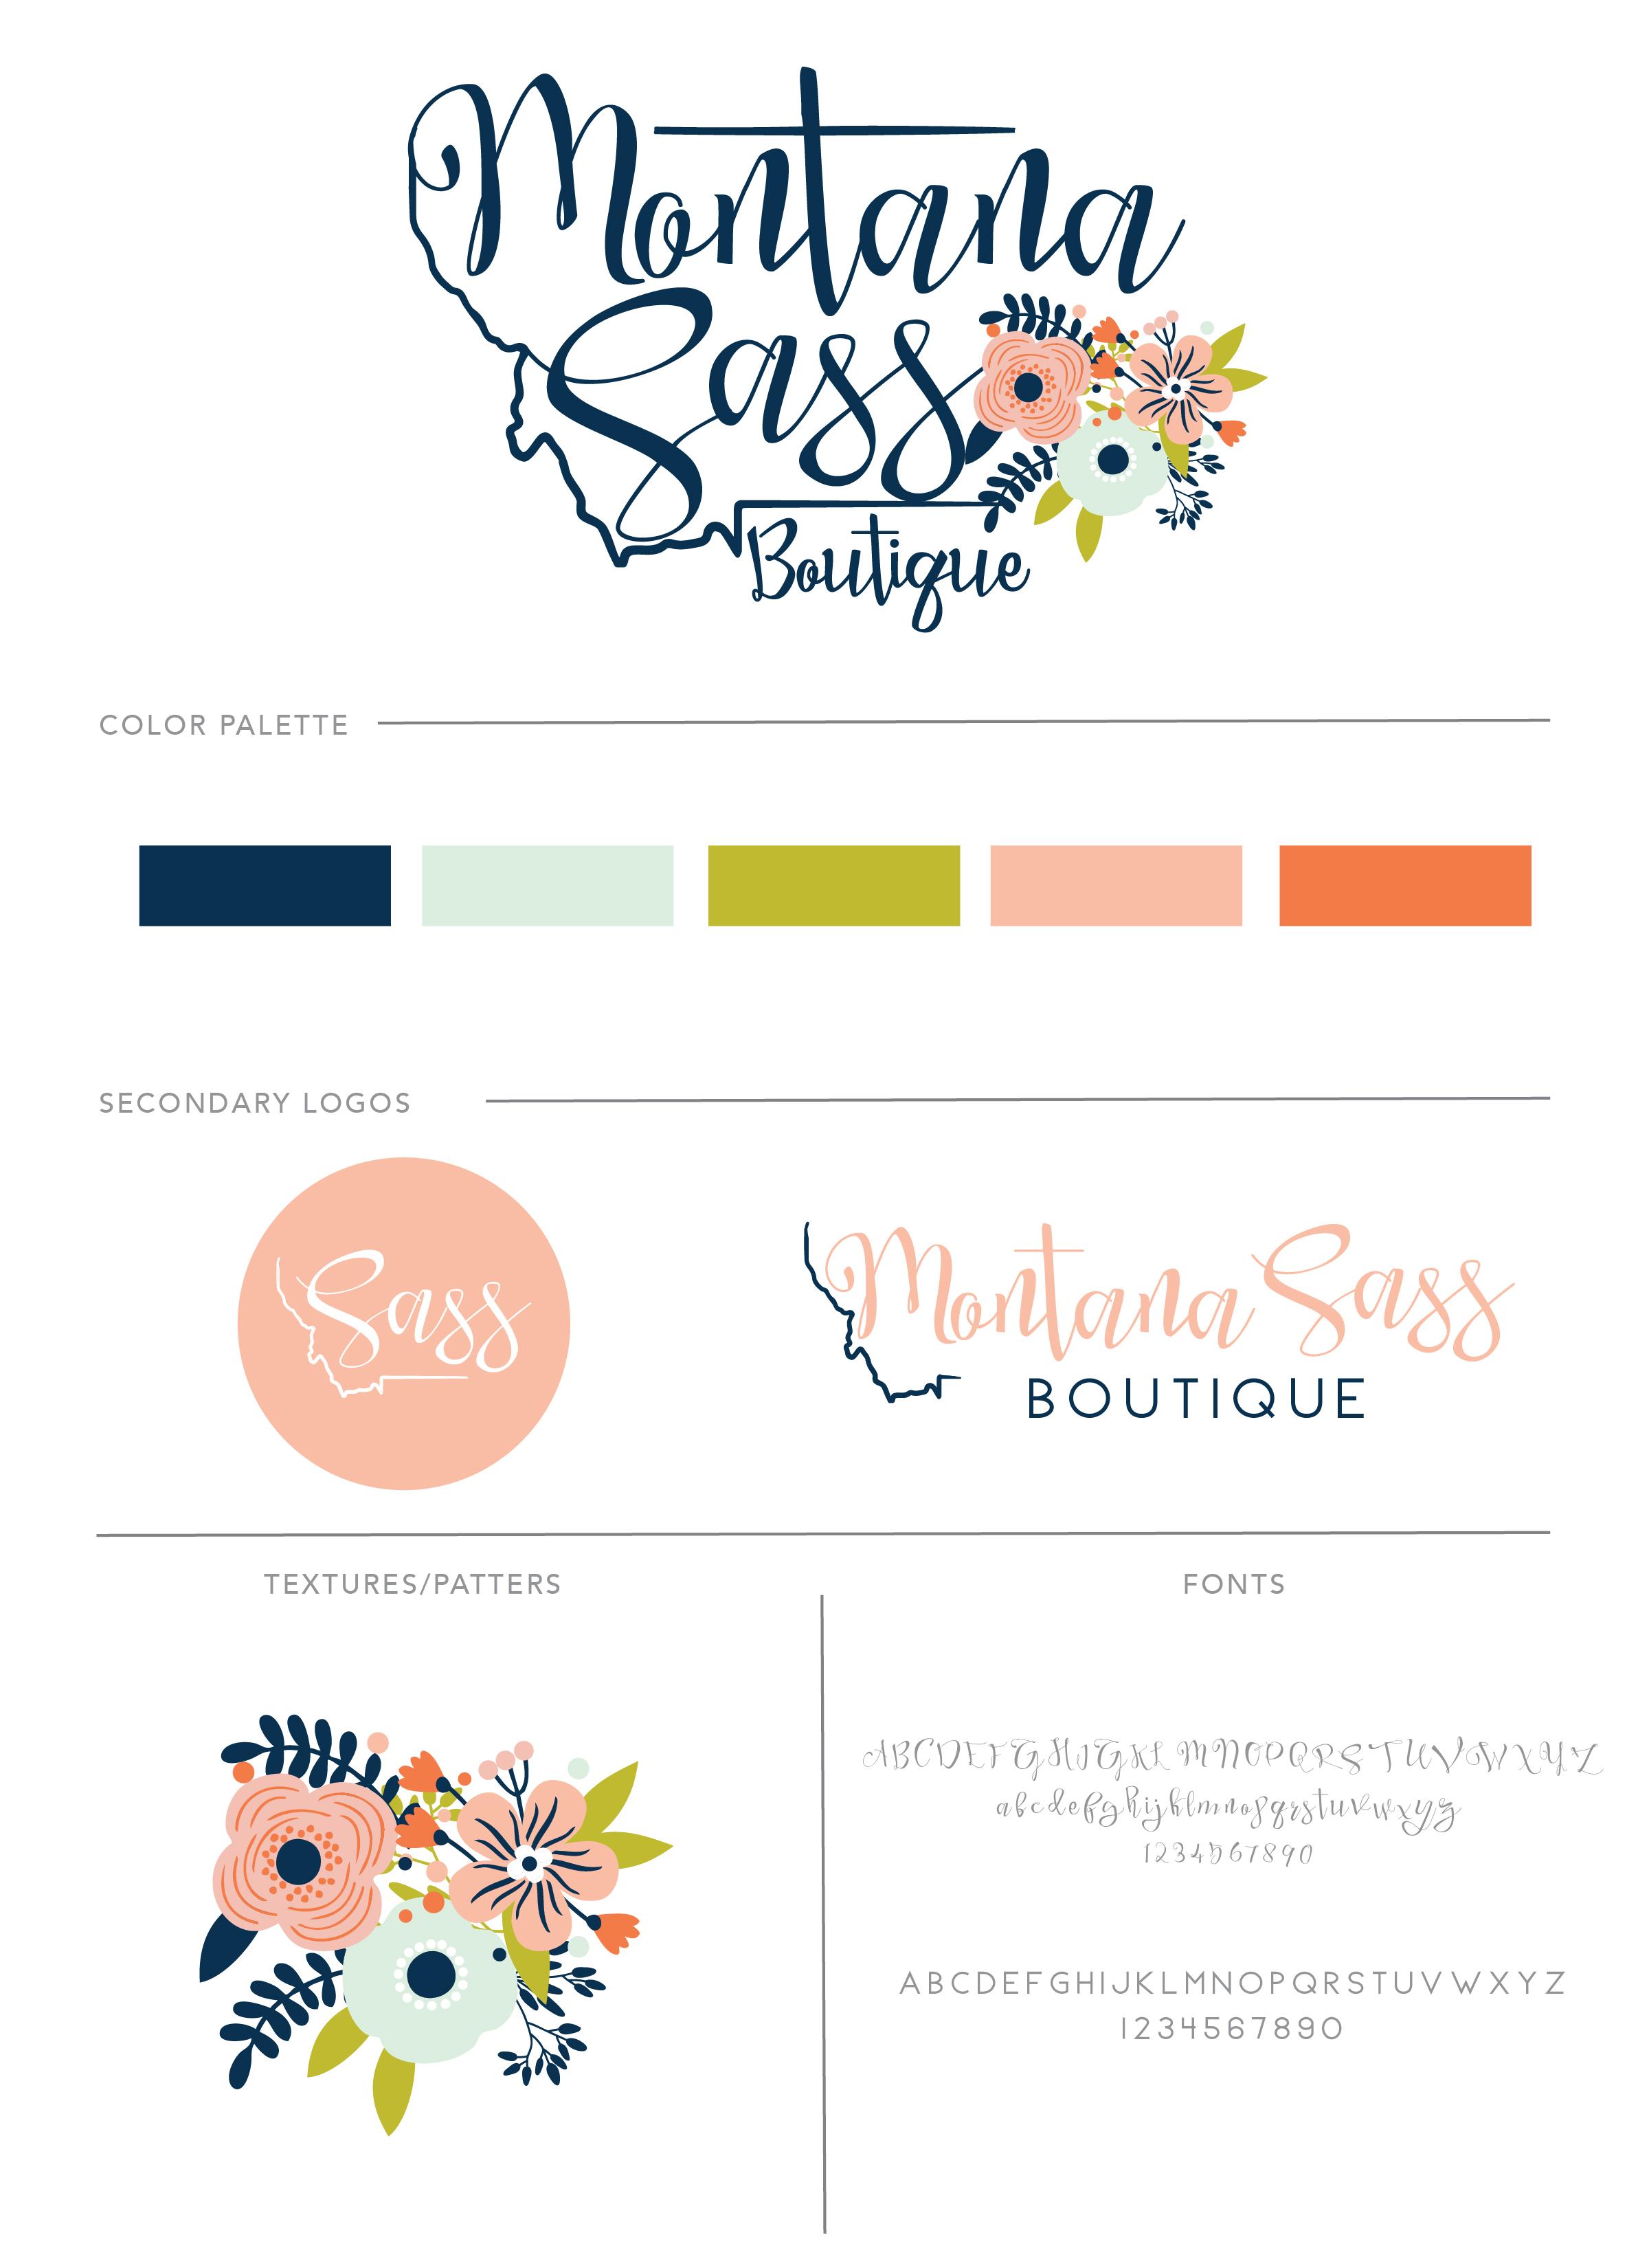 Montana Sass Brand Board-01.jpg